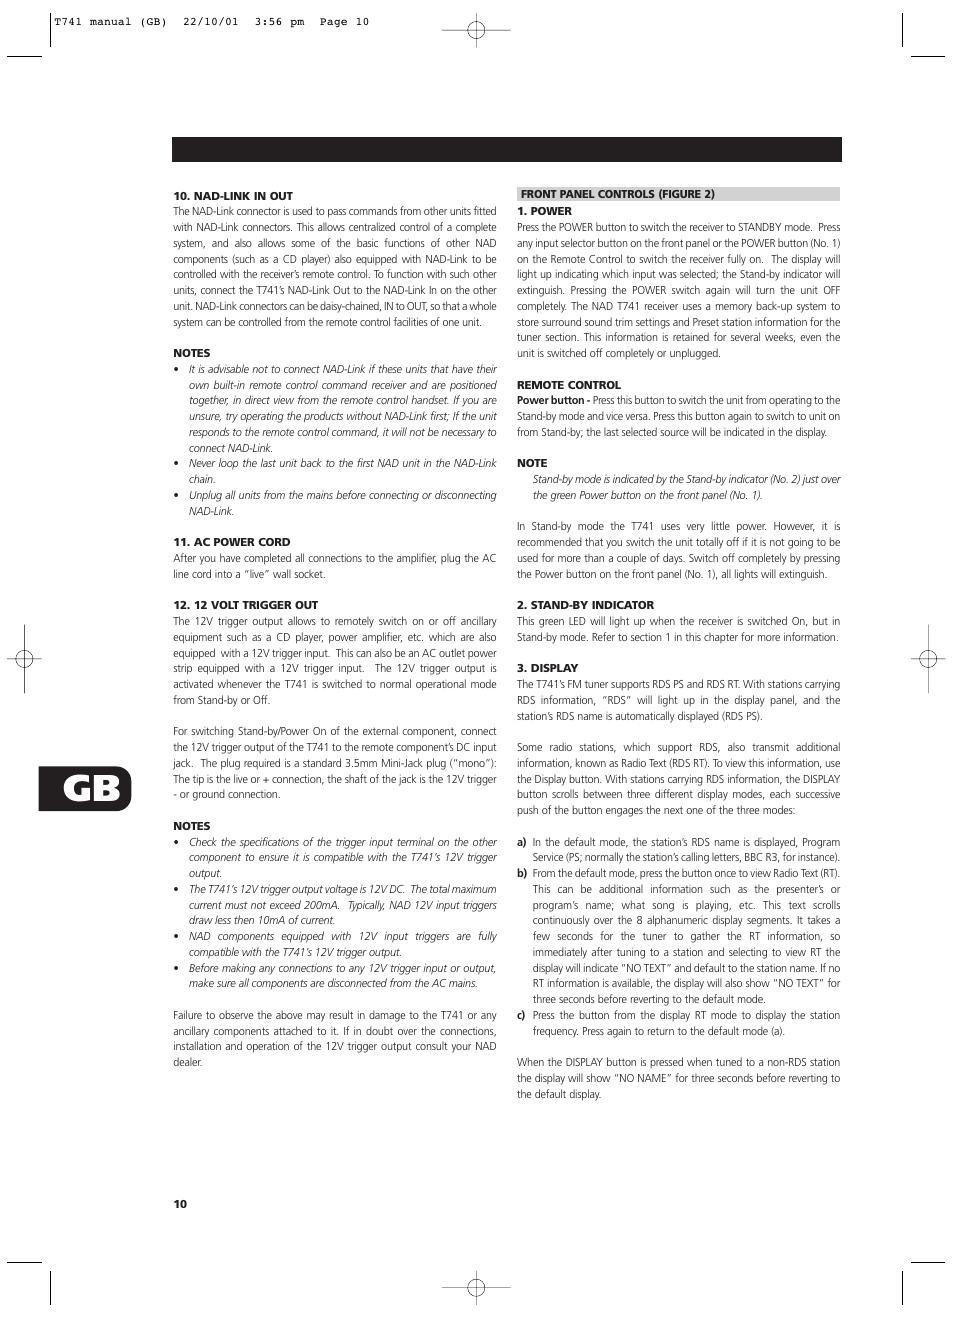 nad t741 user manual page 10 20 original mode rh manualsdir com